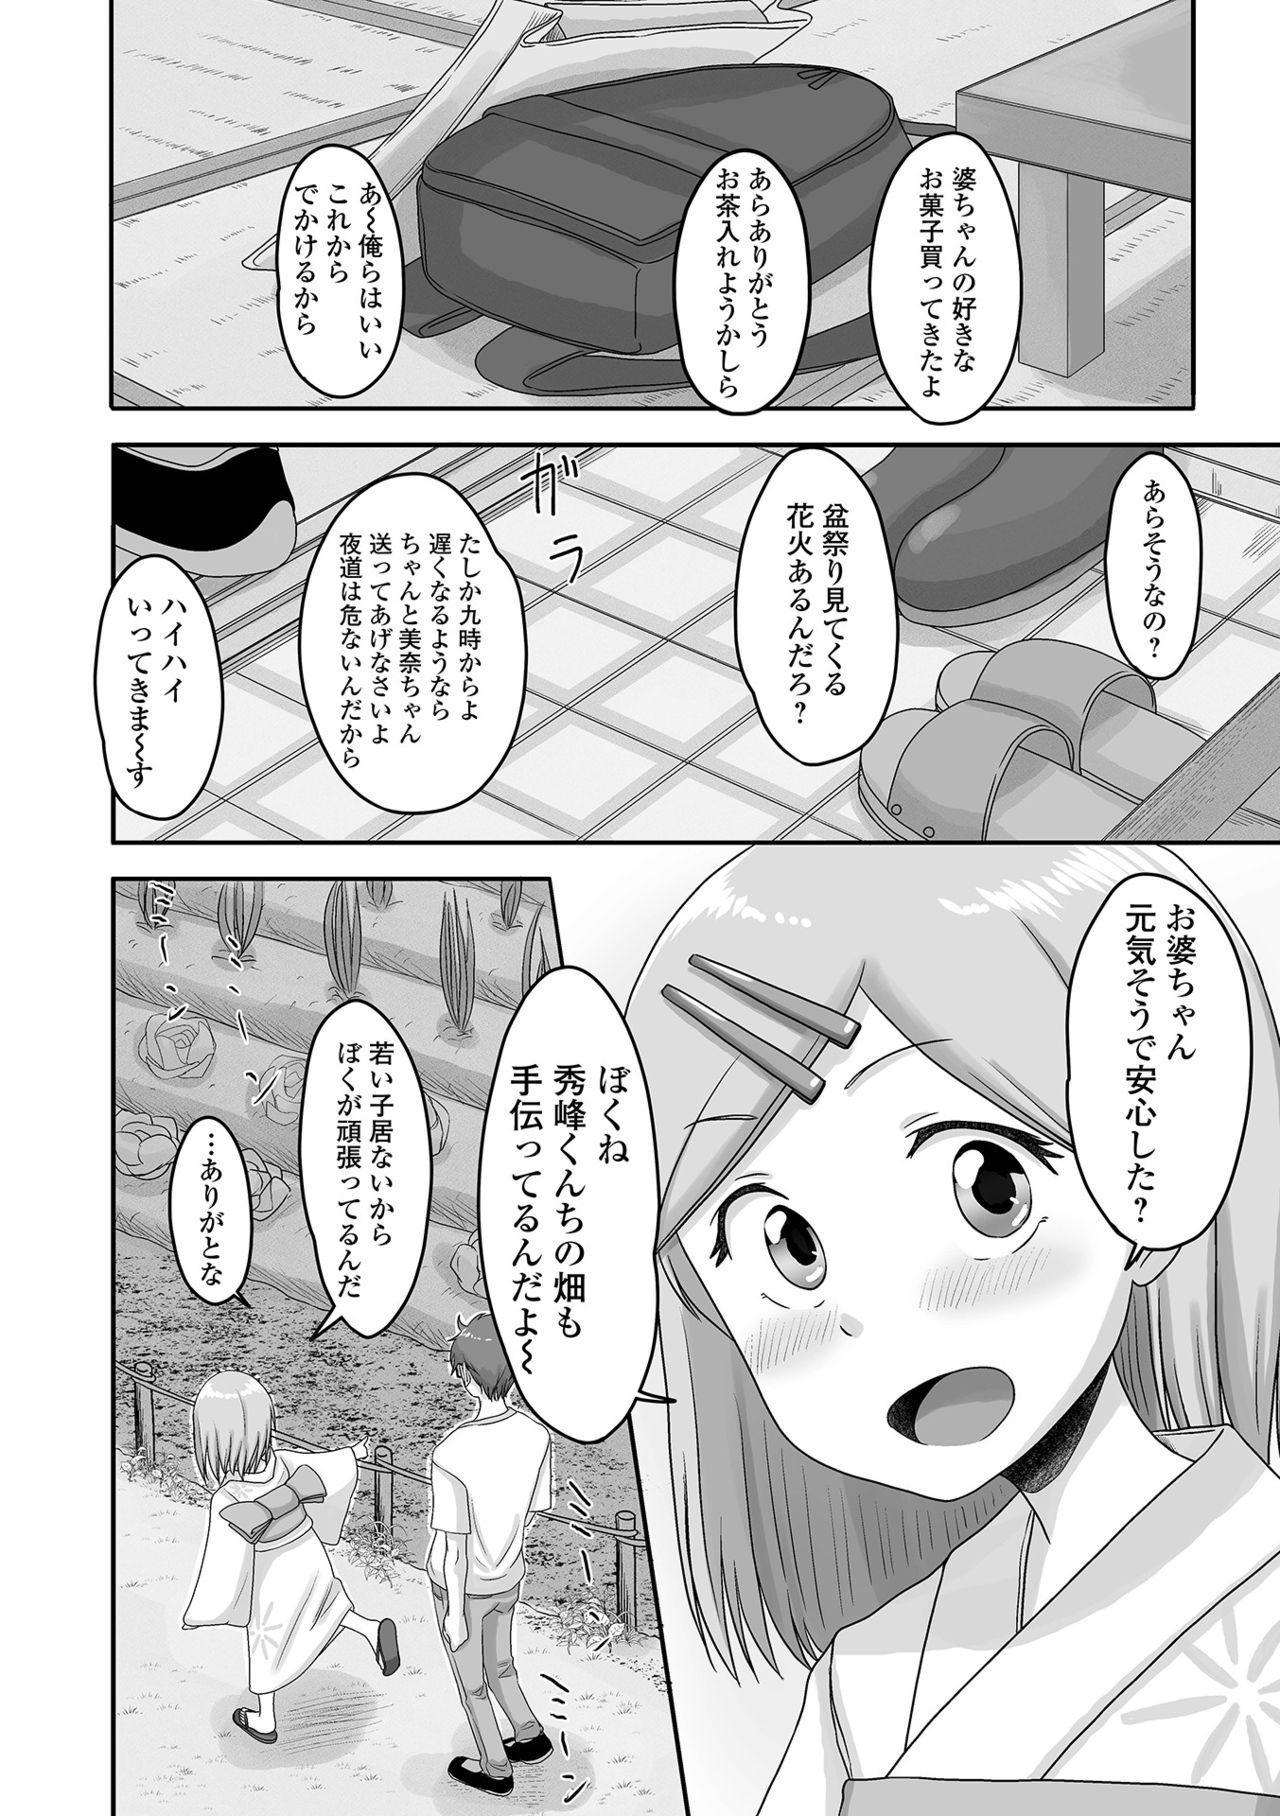 Gekkan Web Otoko no Ko-llection! S Vol. 64 67